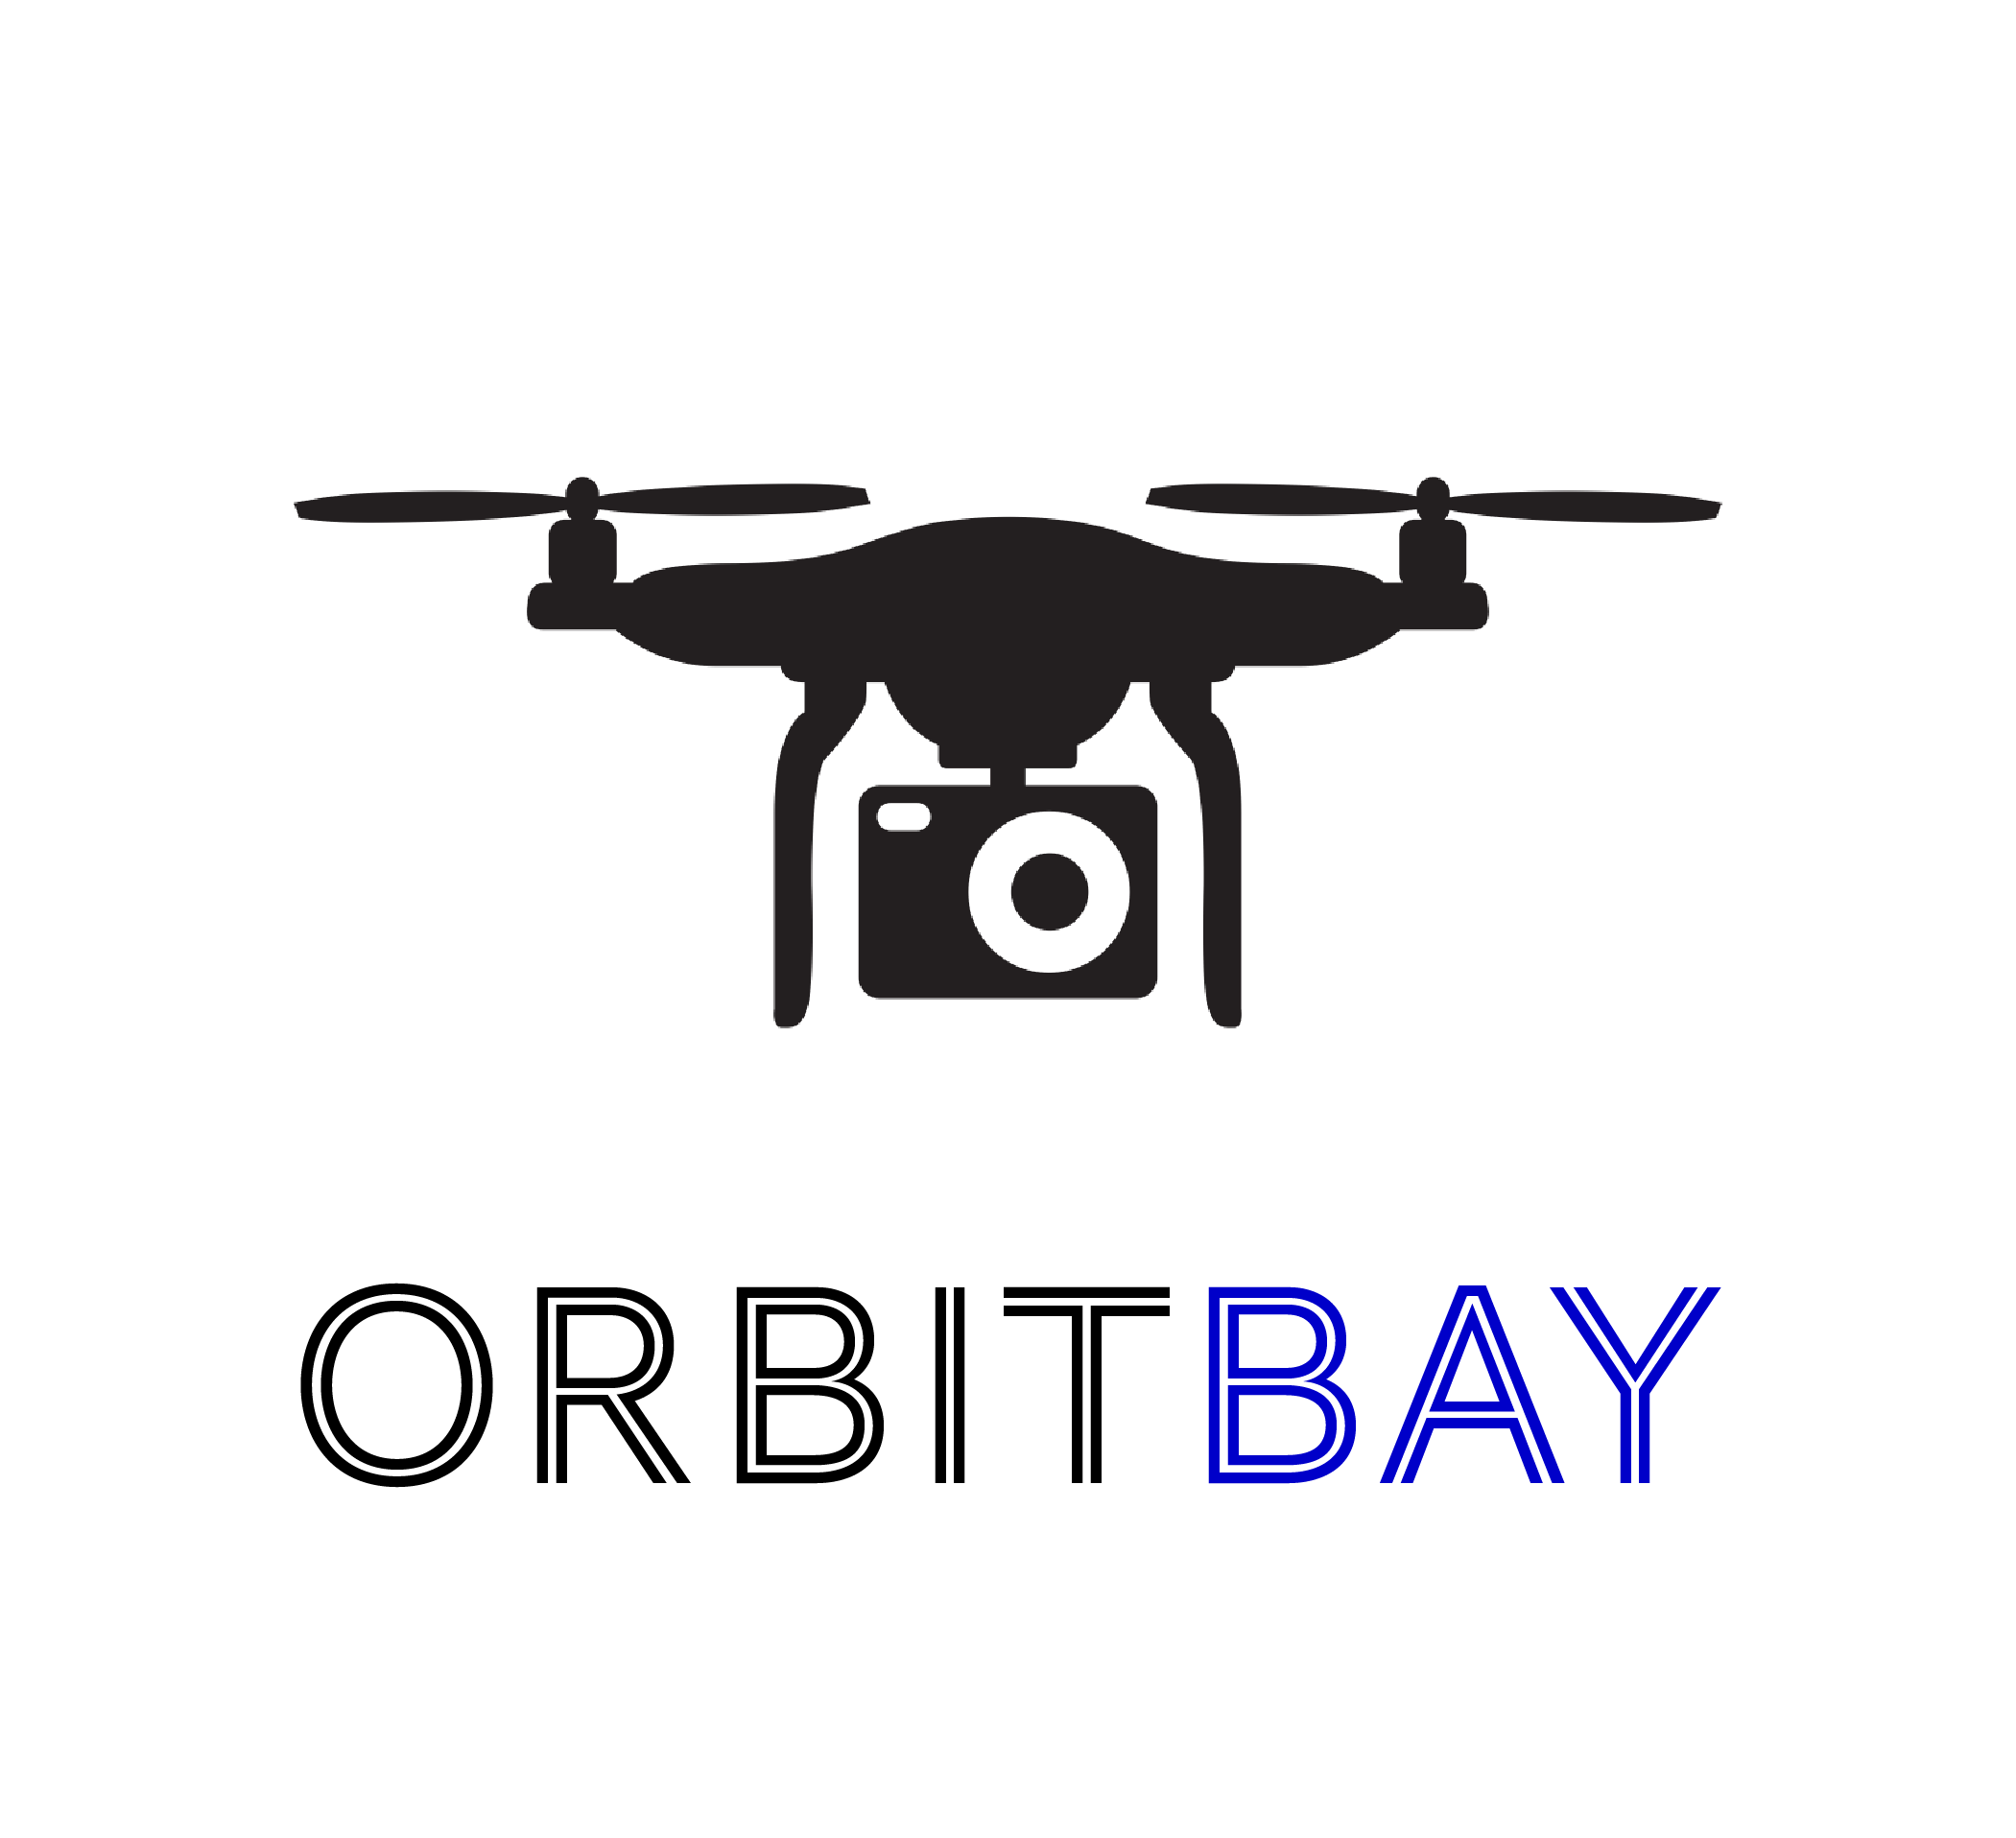 OrbitBay